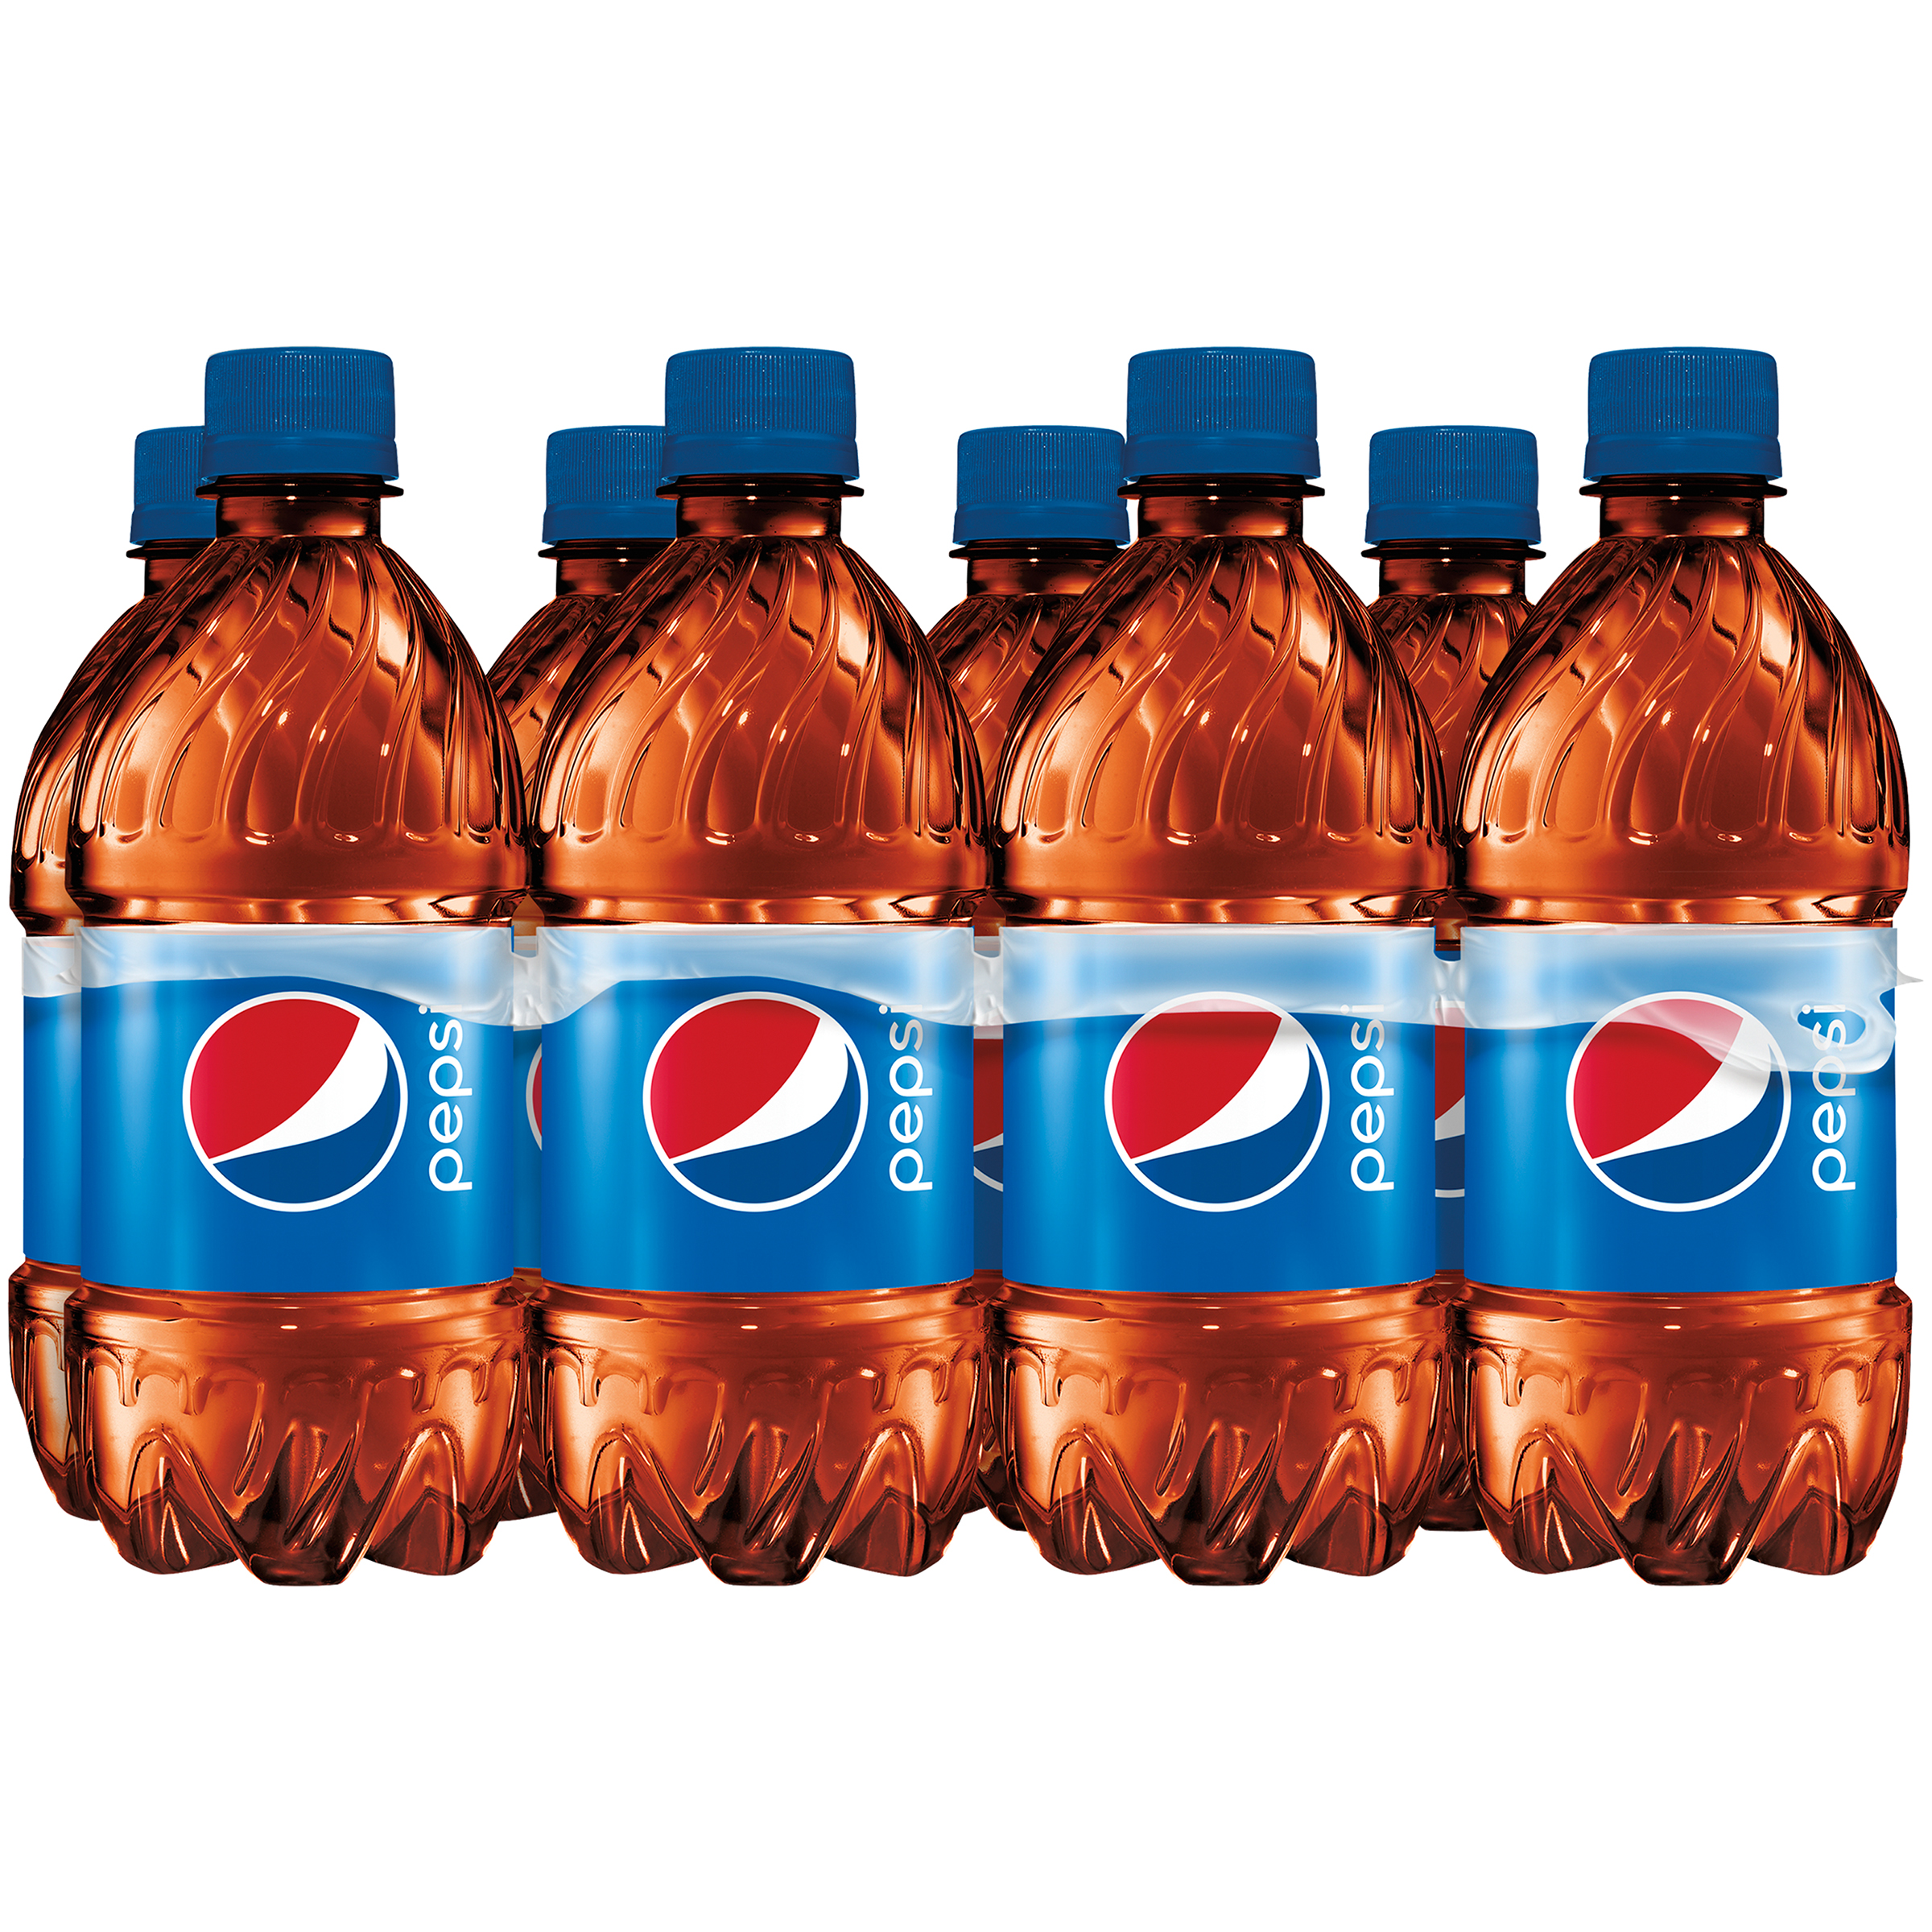 Pepsi 8 Pack 12 fl oz Plastic Bottles Walmart